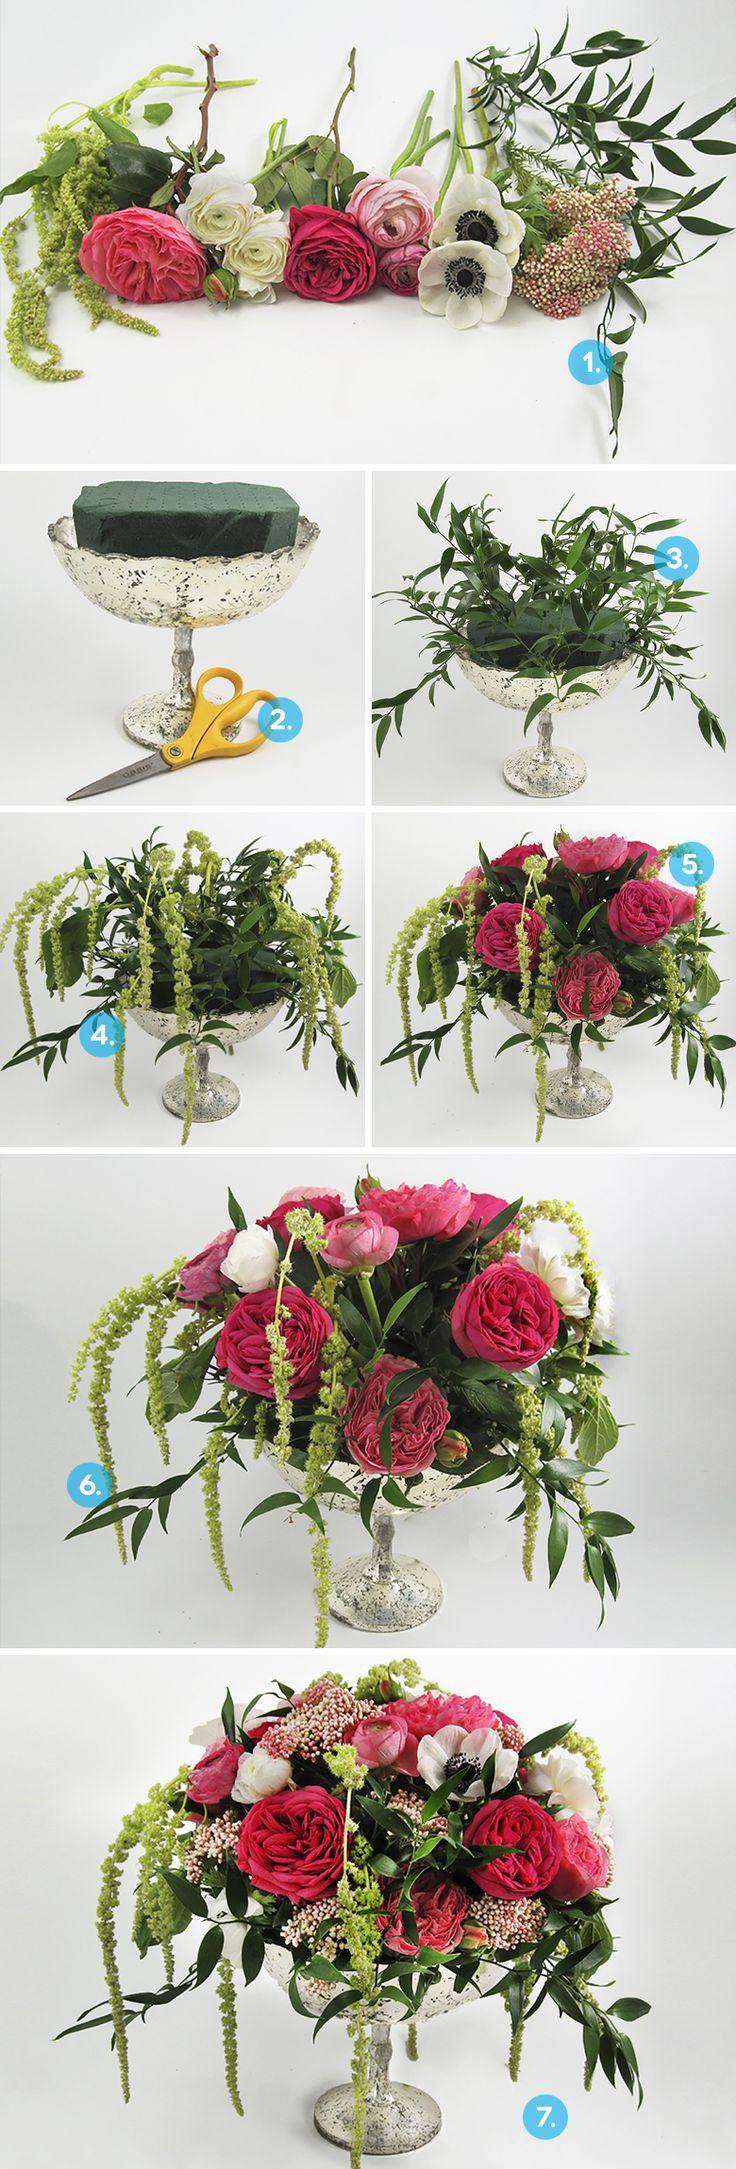 How To: Create a DIY Anemone Centerpiece | A Practical Wedding